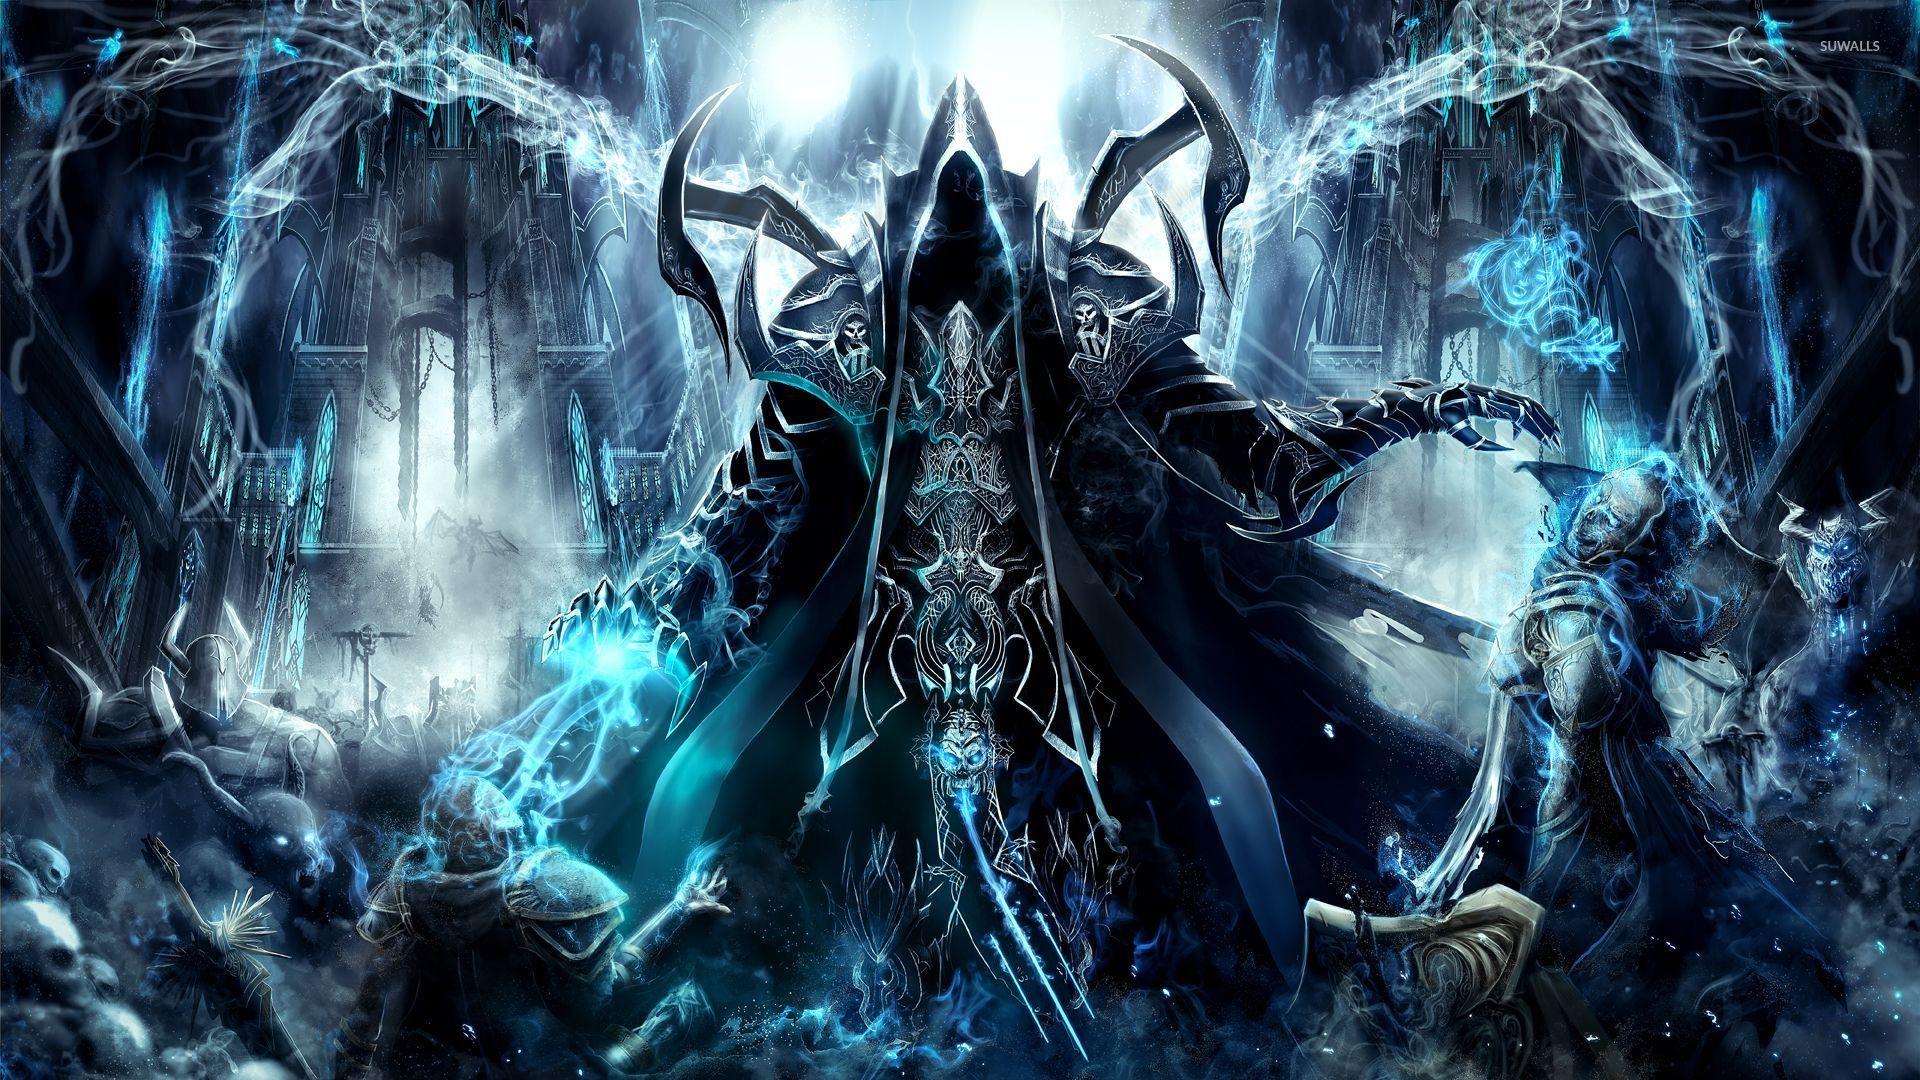 Skyrim Iphone X Wallpaper Wizard In Diablo Iii Reaper Of Souls Wallpaper Game